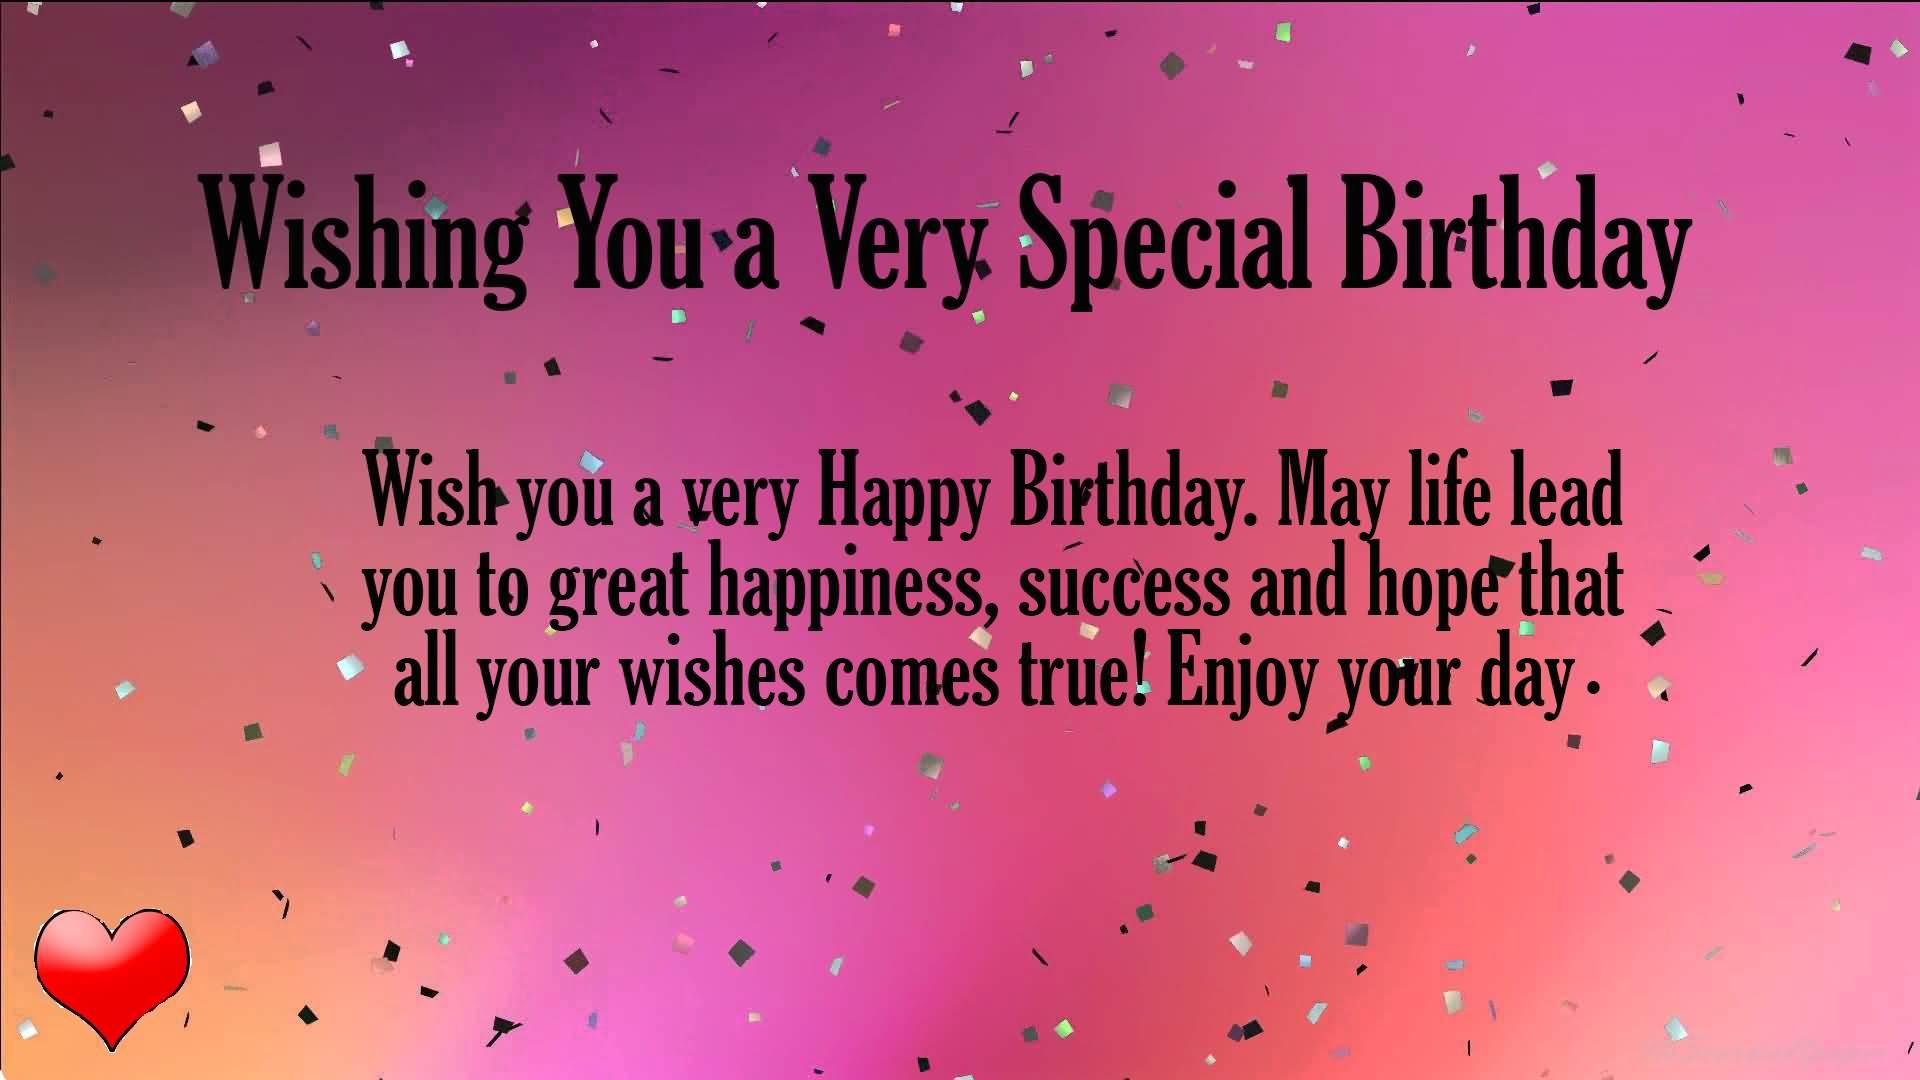 Wishing You A Very Best Friend Birthday Quotes Heart Touching Birthday Wishes For Best Friend Female 1920x1080 Wallpaper Teahub Io